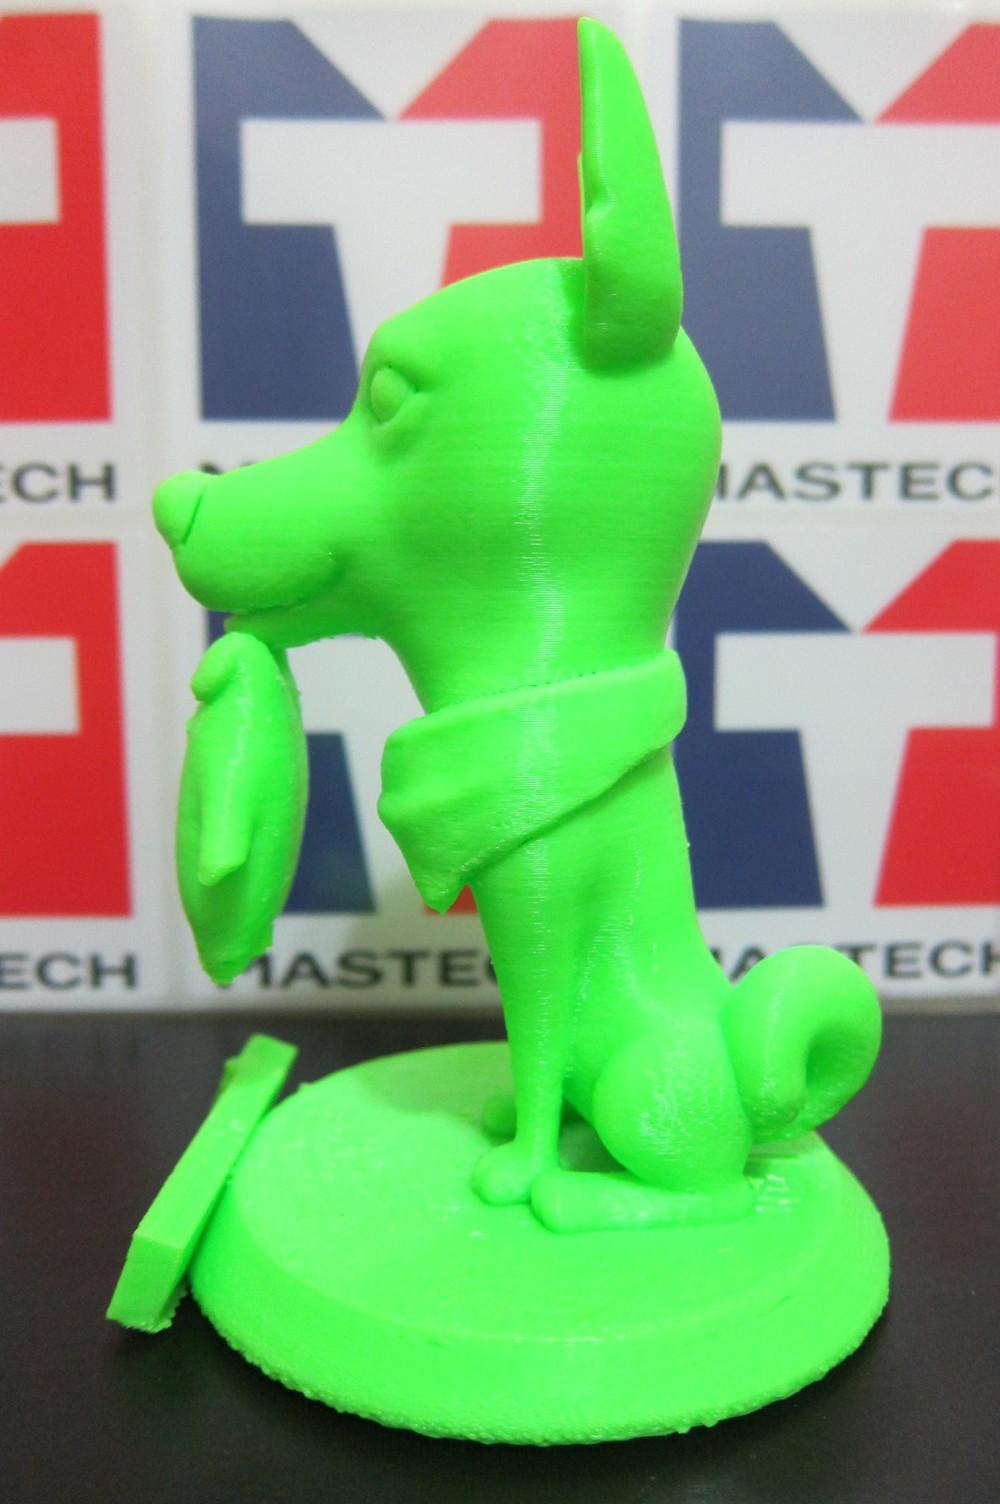 Mastech 3D printer